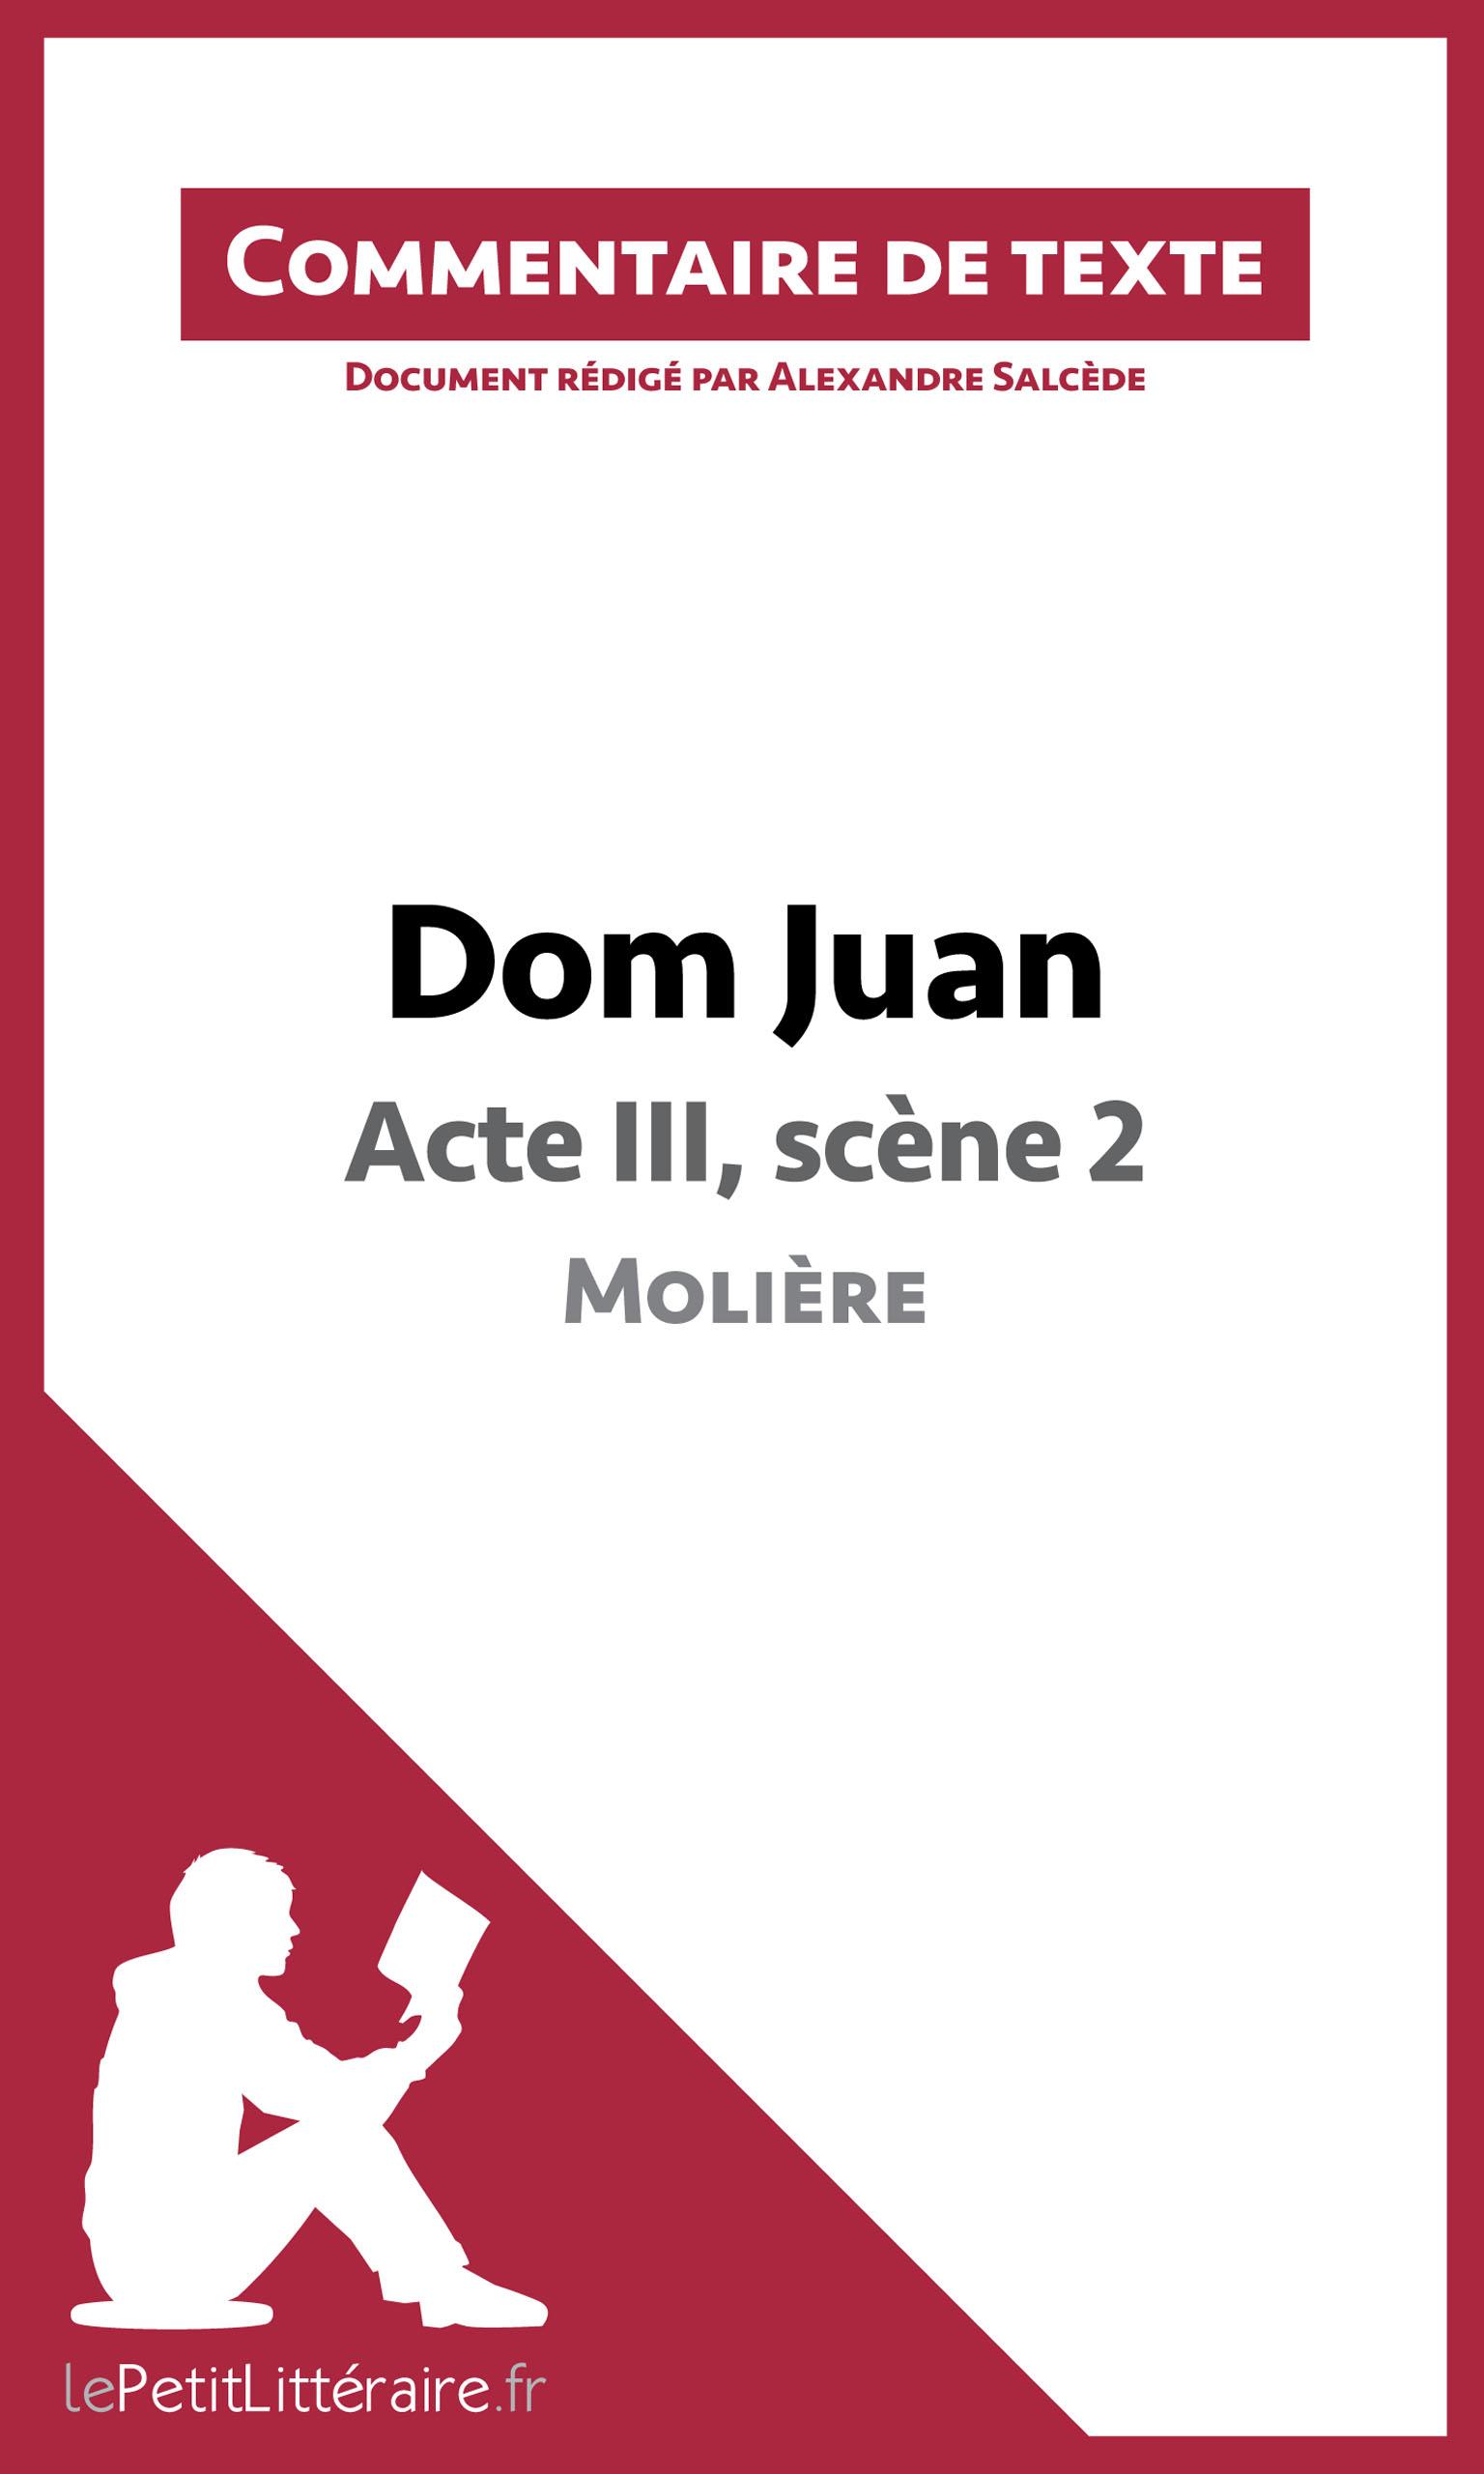 Dom Juan - Acte III, sc?ne 2 - Moli?re (Commentaire de texte)